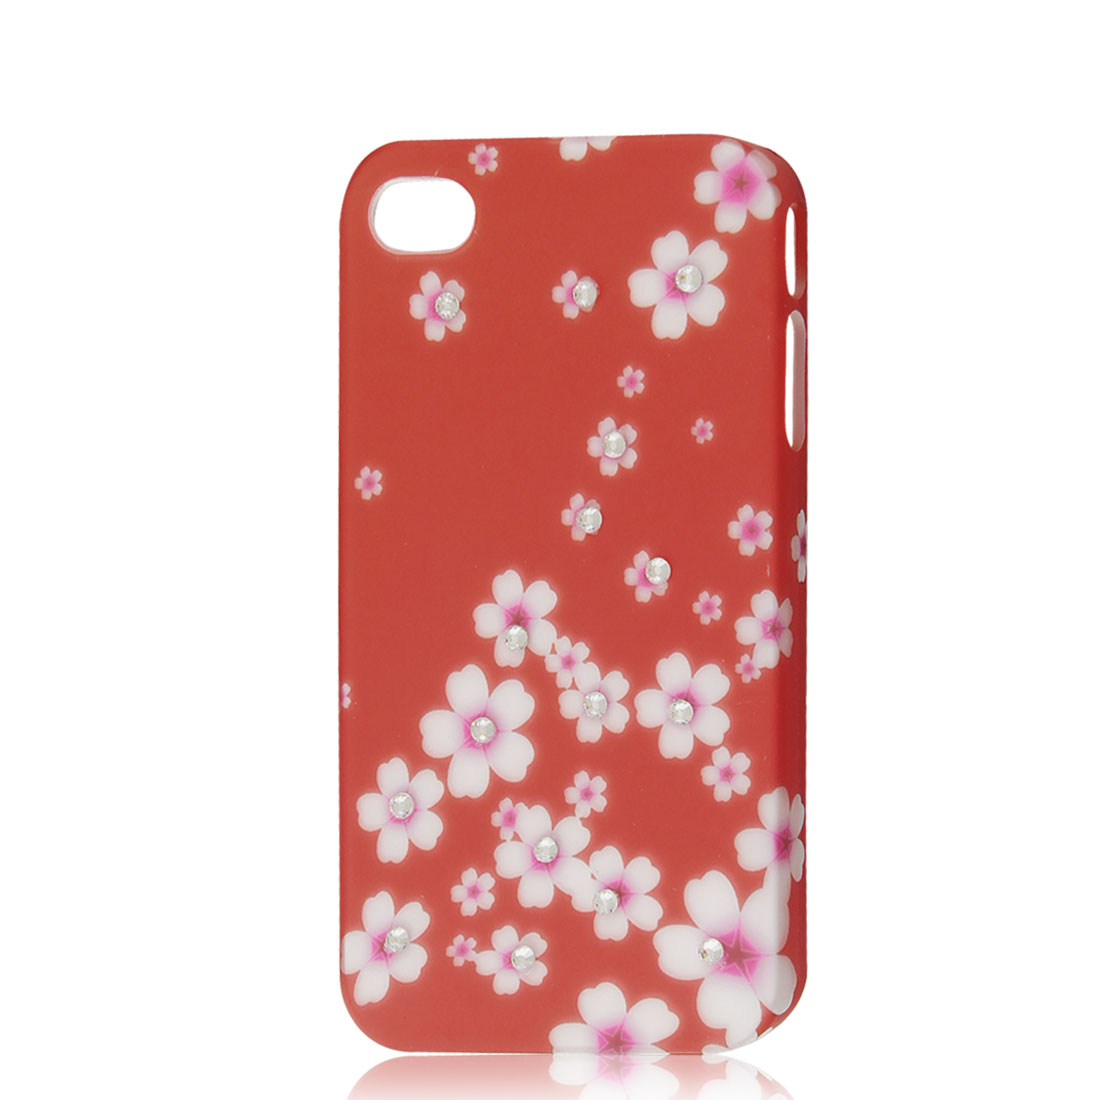 Glitter Rhinestone Flower Hard Case Back Cover Orange Red for iPhone 4 4G